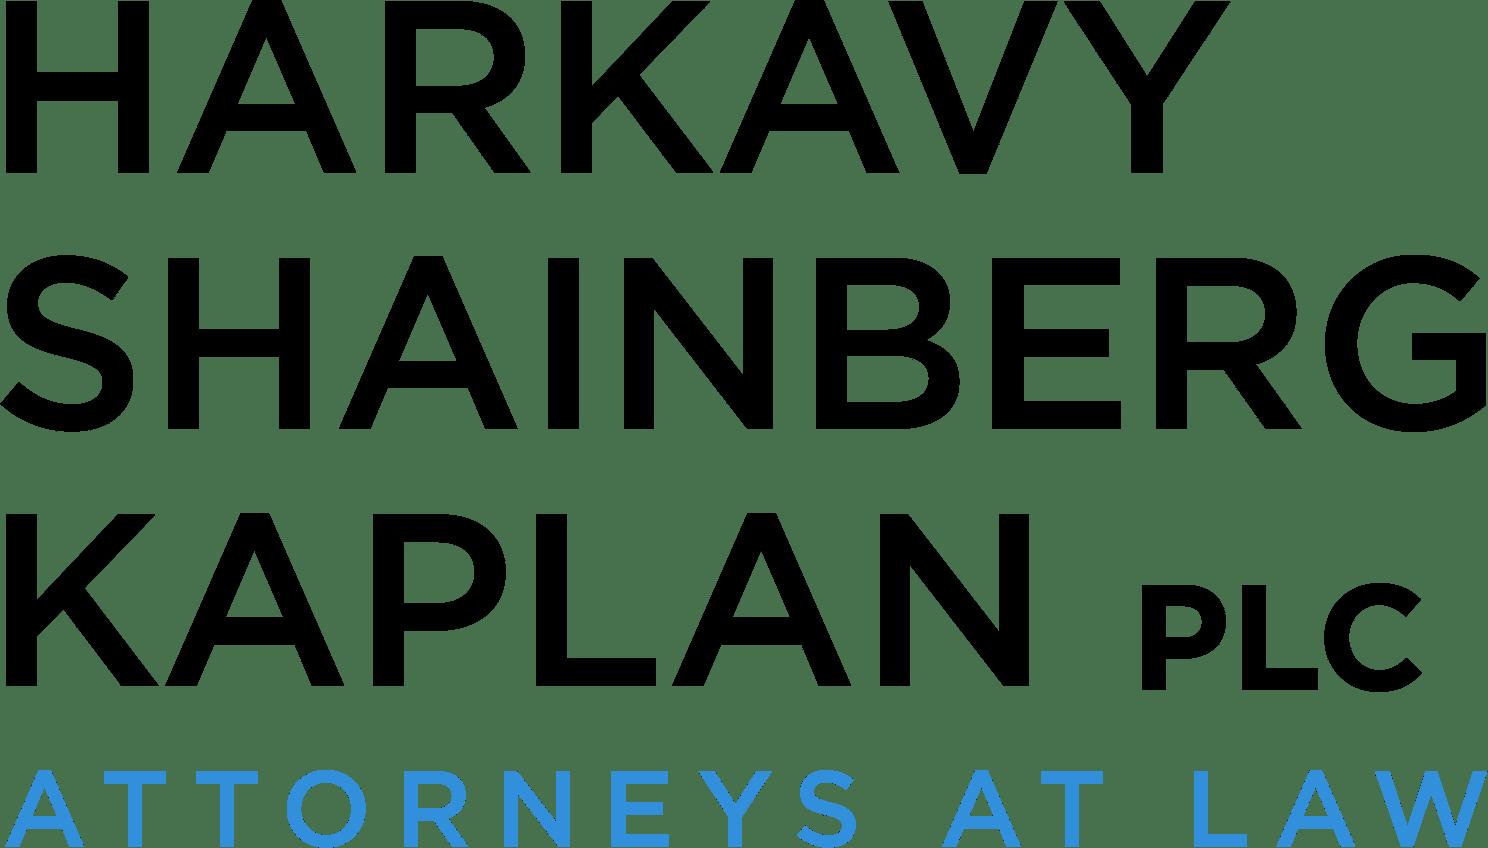 Harkavy Shainberg Kaplan PLC